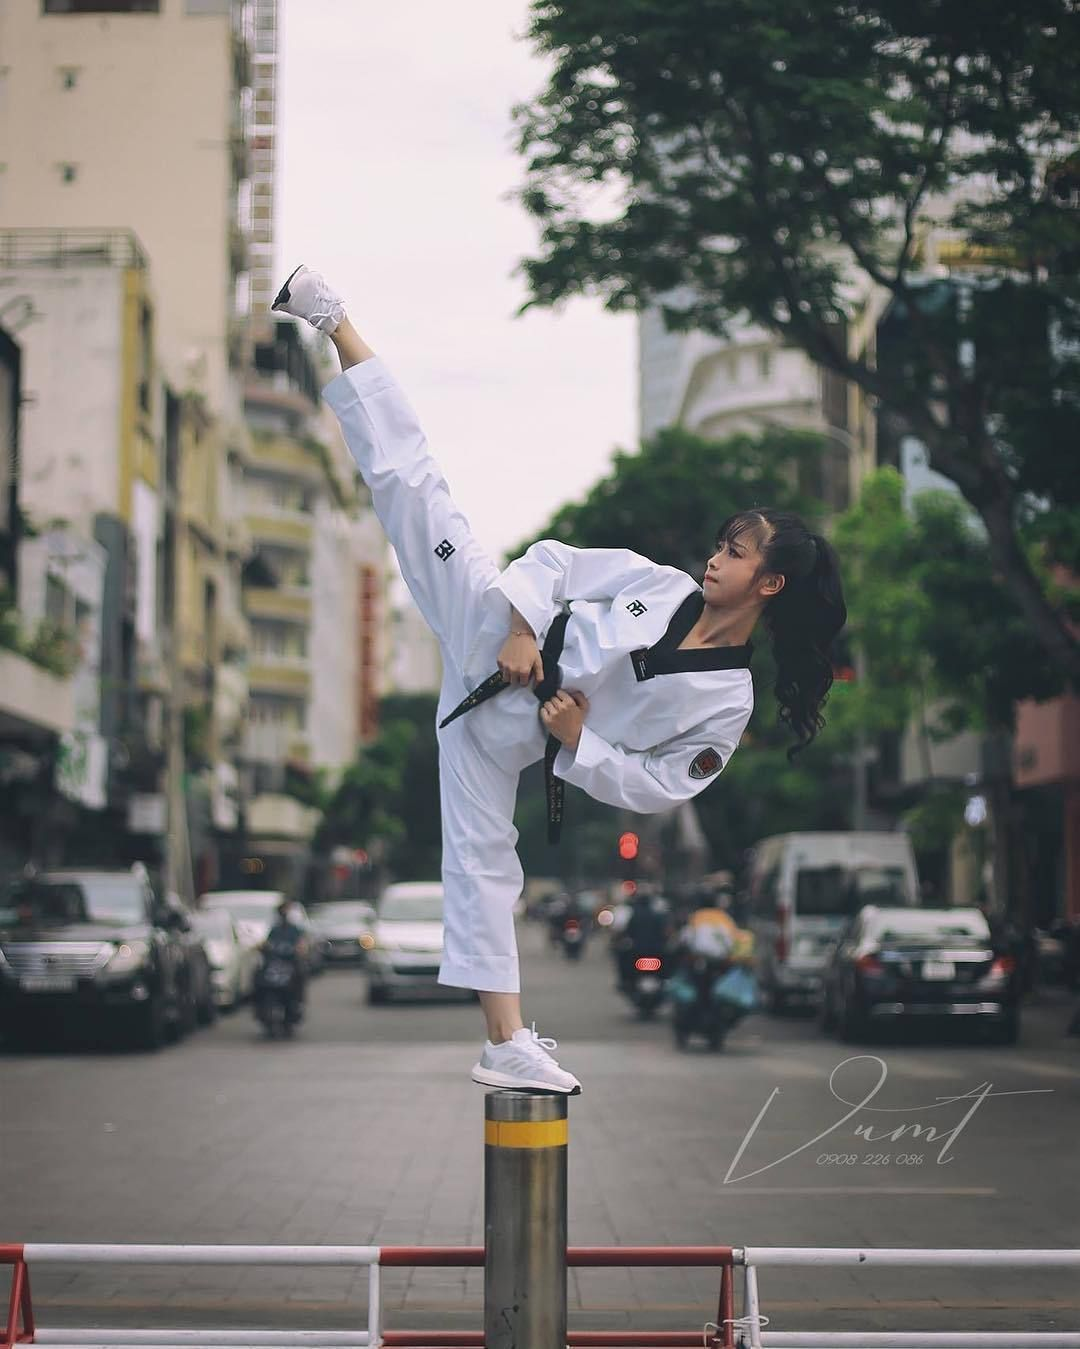 Theblindninja Taekwondo Girl Karate Photos Karate Girl